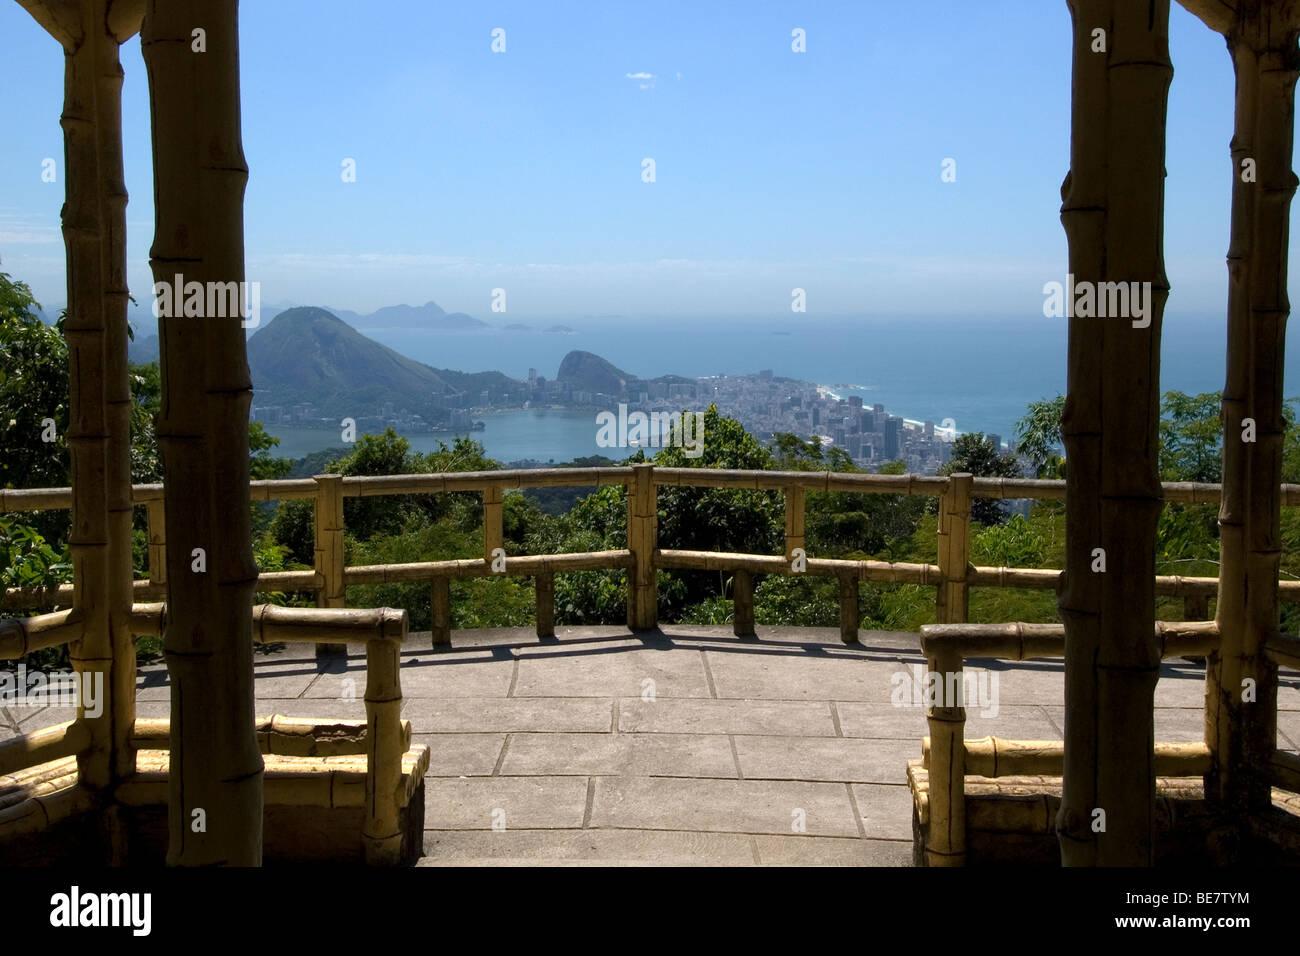 City view from Chinese Pagoda, Rio de Janeiro, Brazil Stock Photo